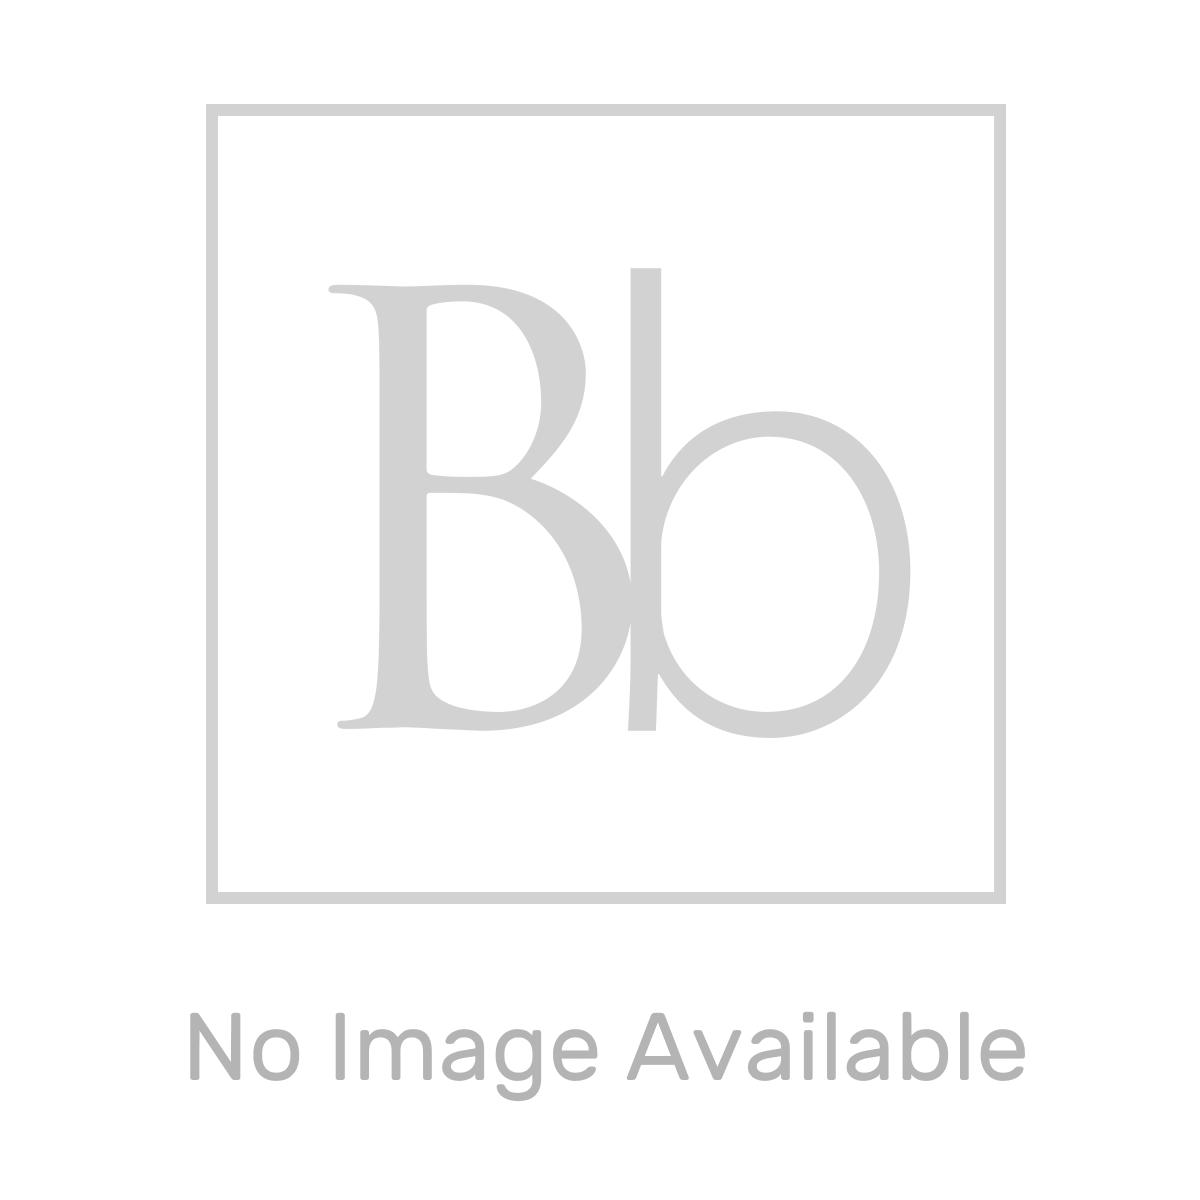 RAK Series 600 Toilet and 400 Series Walnut Vanity Unit Basin